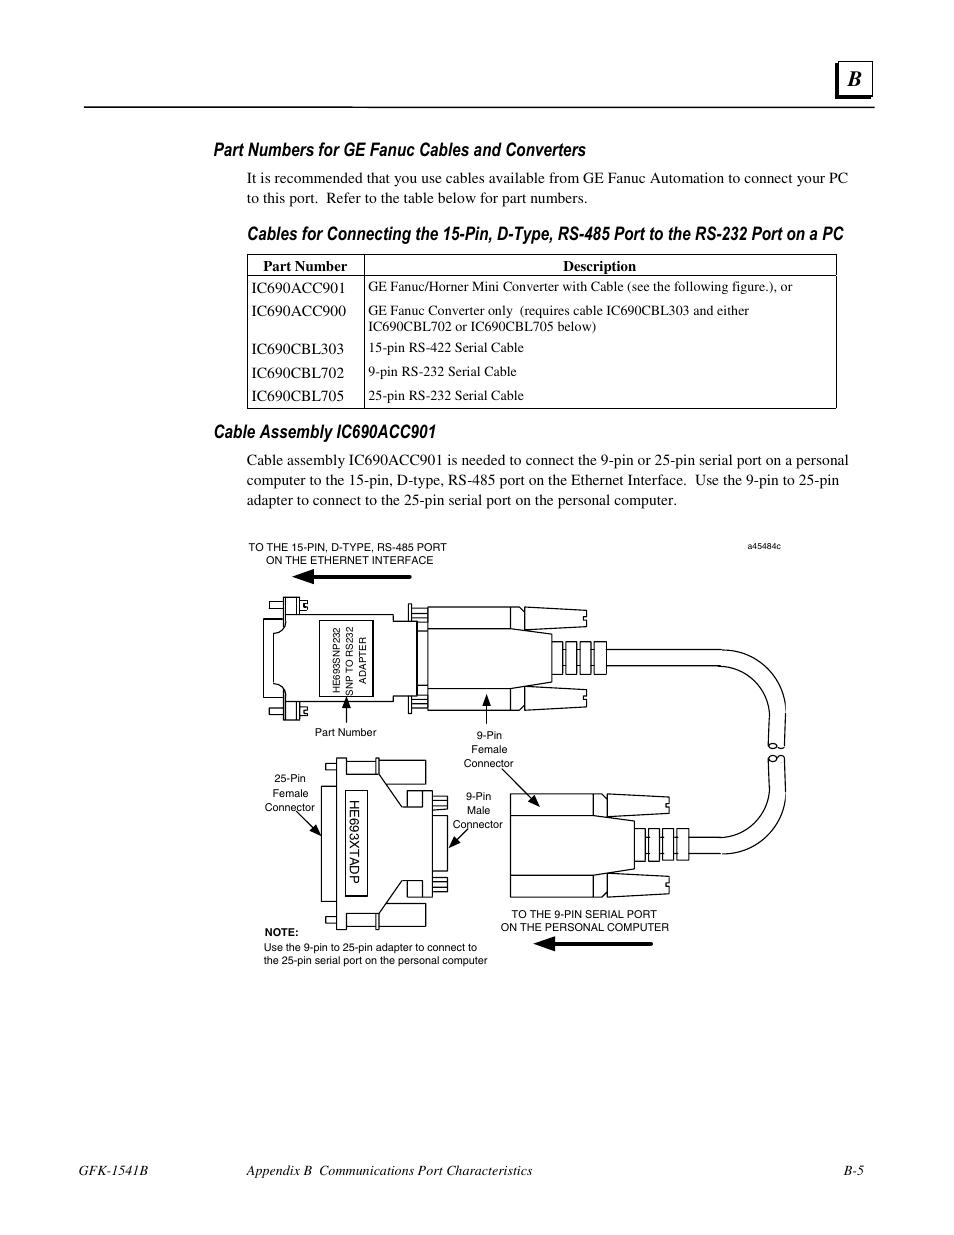 Ge Fanuc Omc Manual Alumacraft Maverick Wiring Diagram Boat Array Part Numbers For Cables And Converters Robotics Rh Manualsdir Com